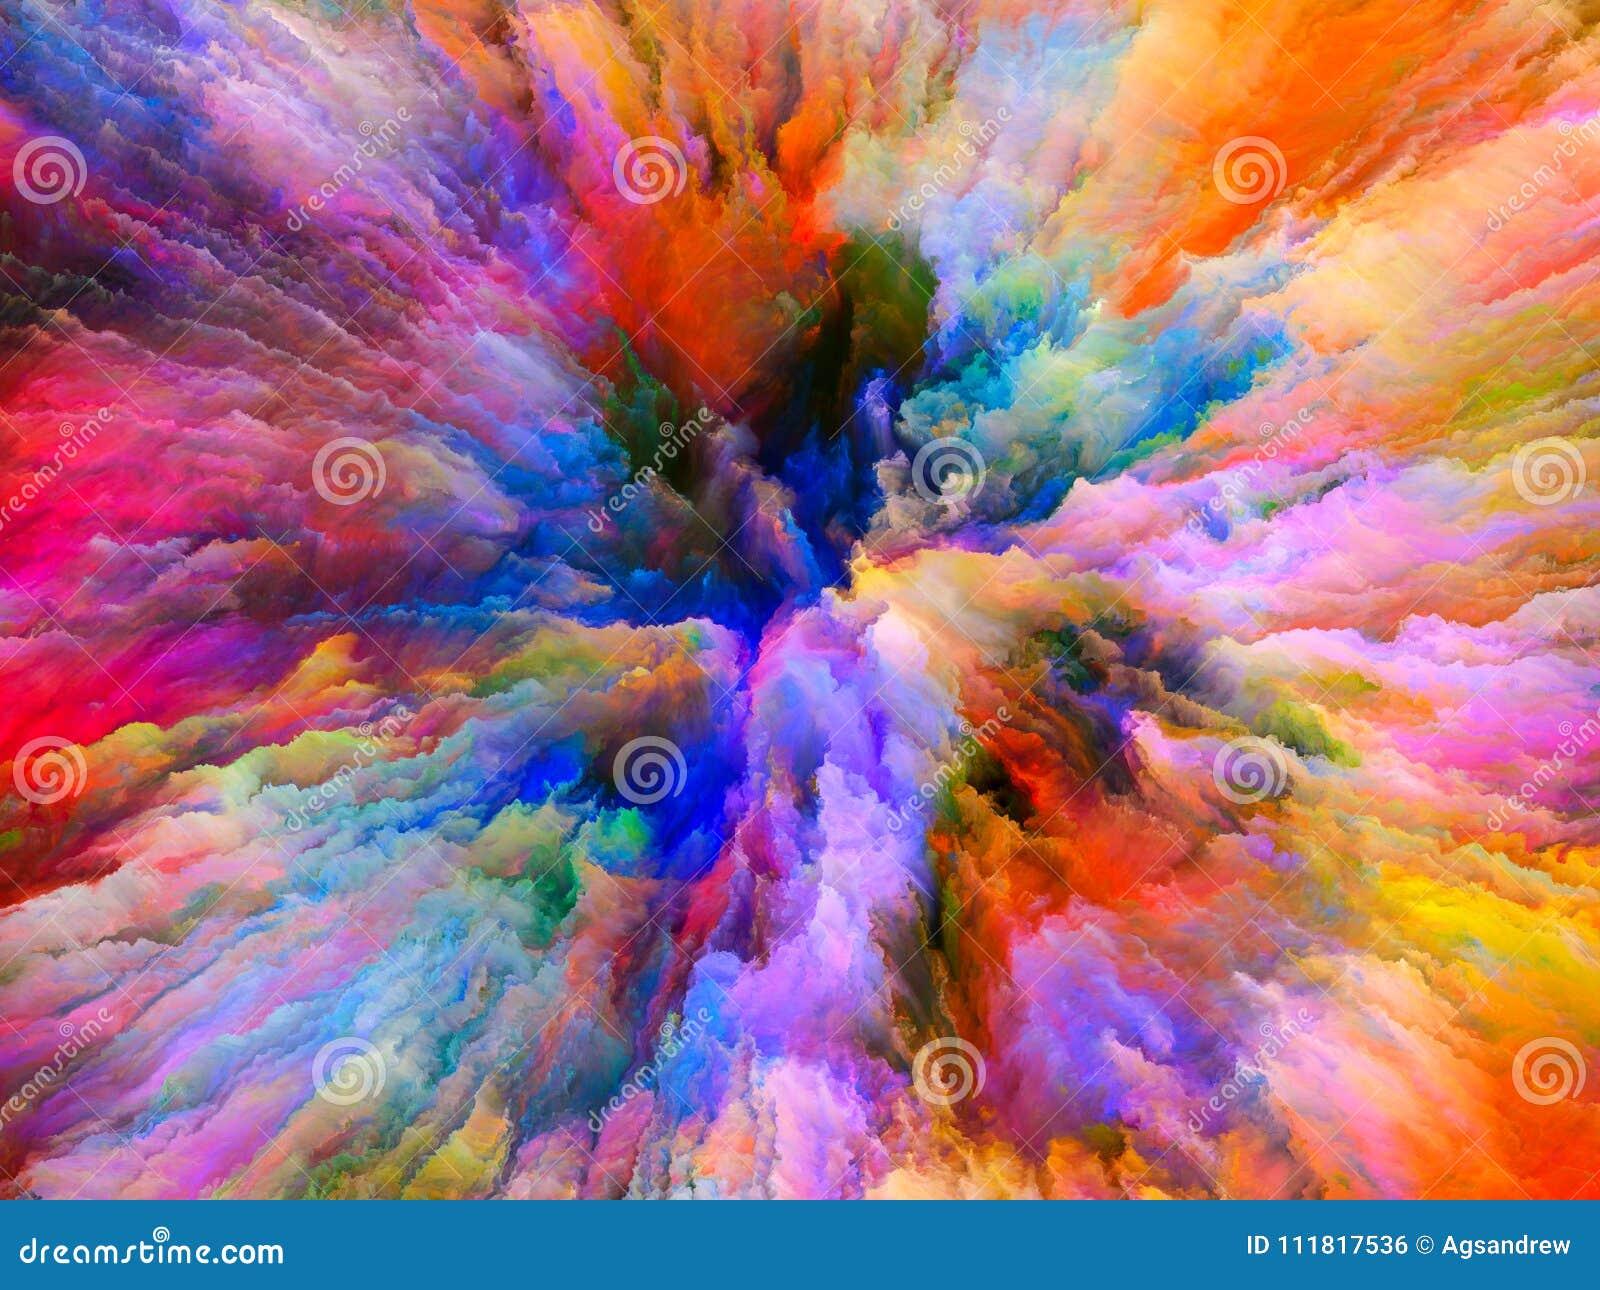 paradigm of surreal paint stock illustration illustration of